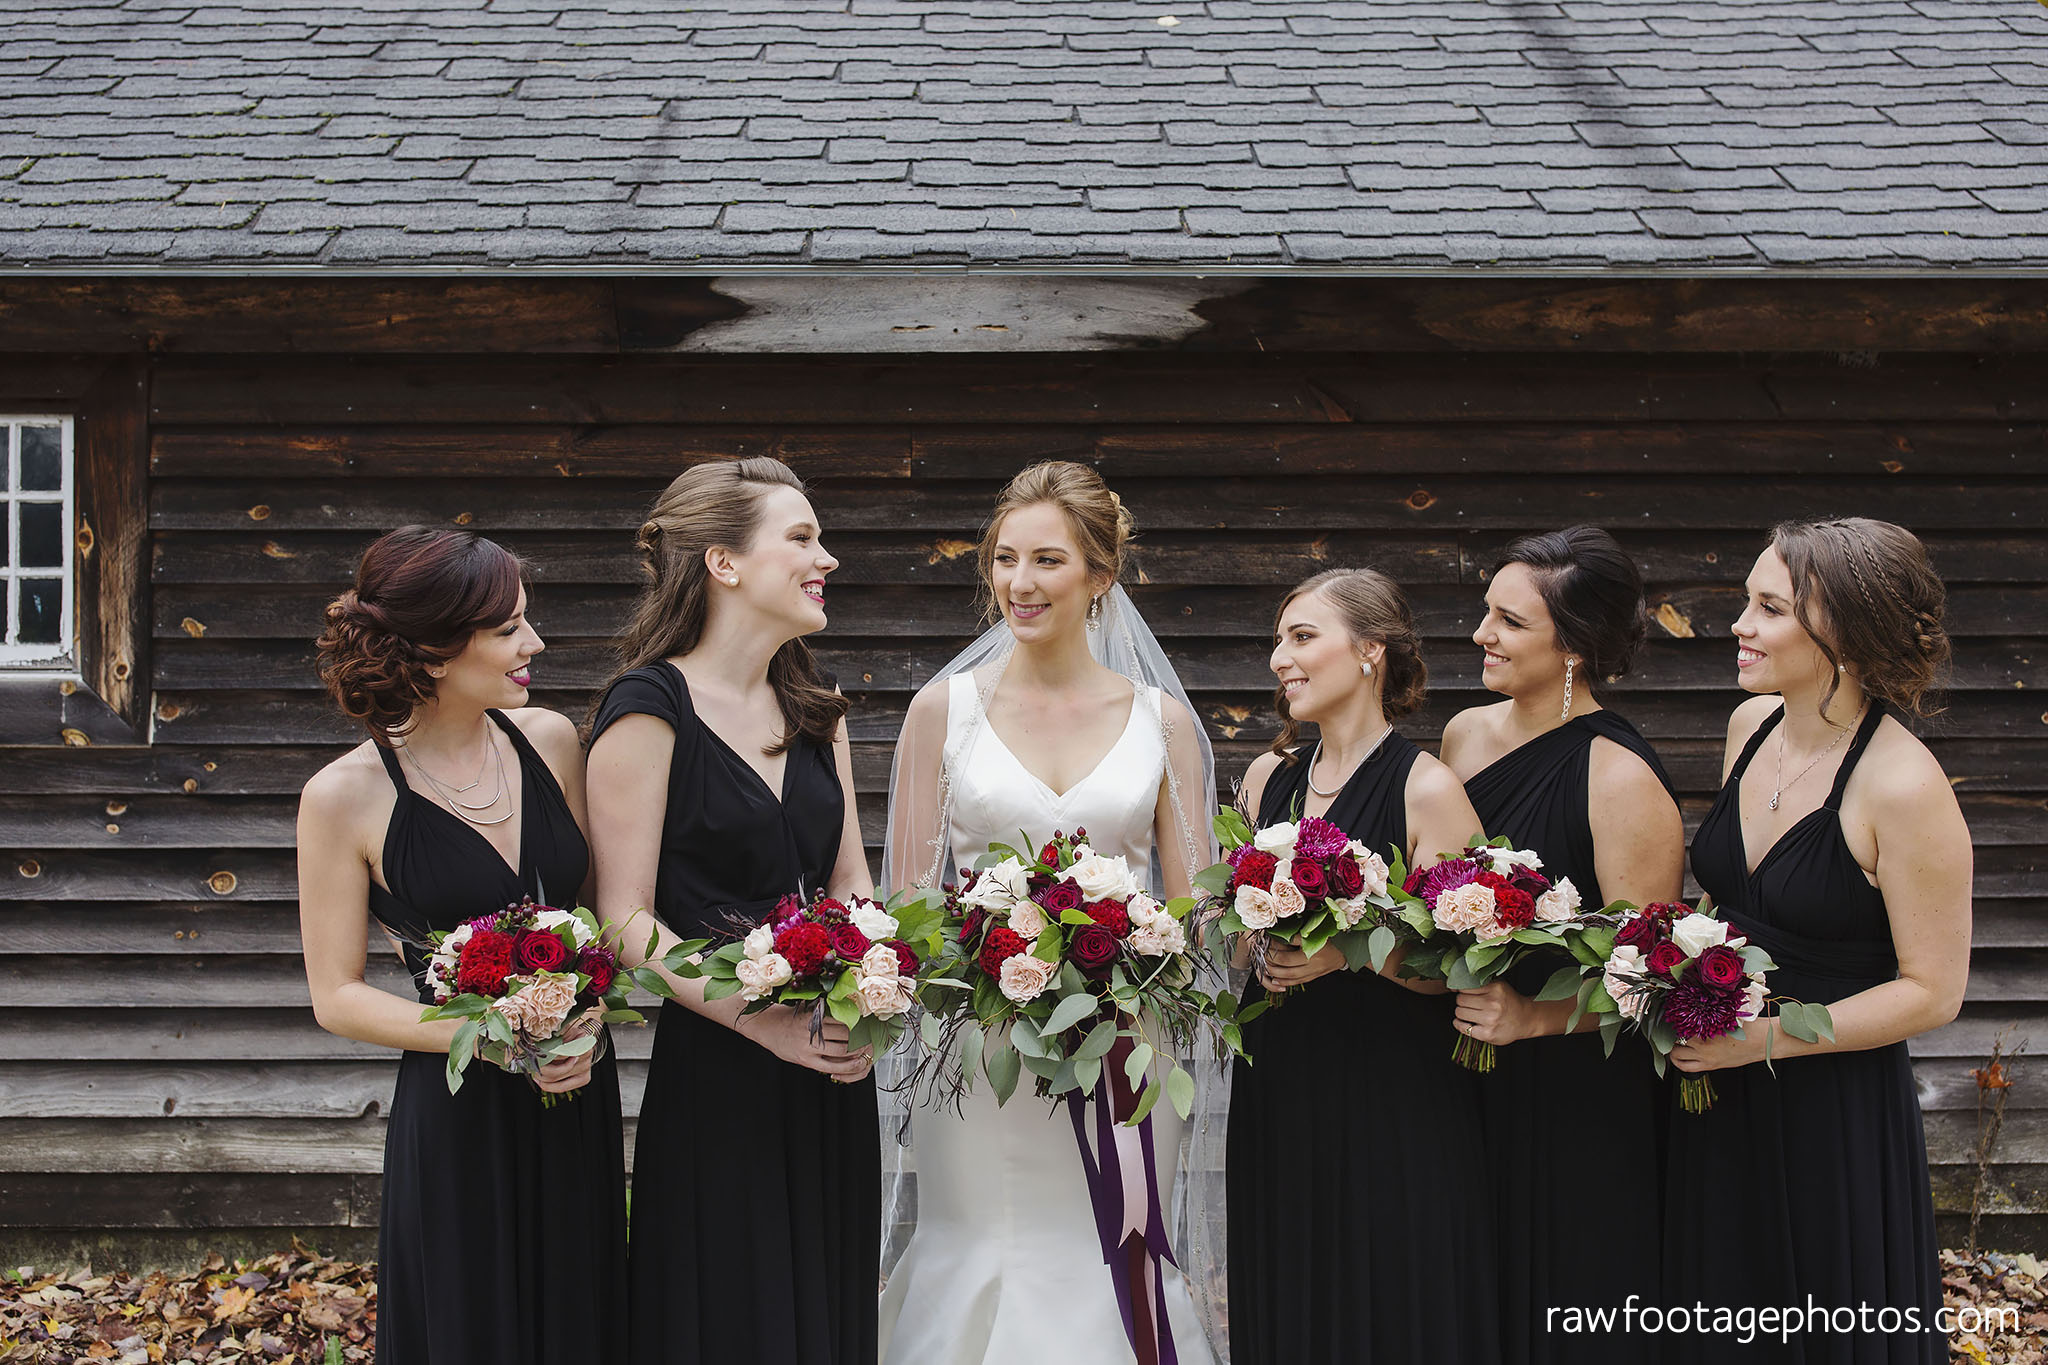 london_ontario_wedding_photos-fall_wedding_photography-raw_footage_photography-elm_hurst_inn_wedding013.jpg